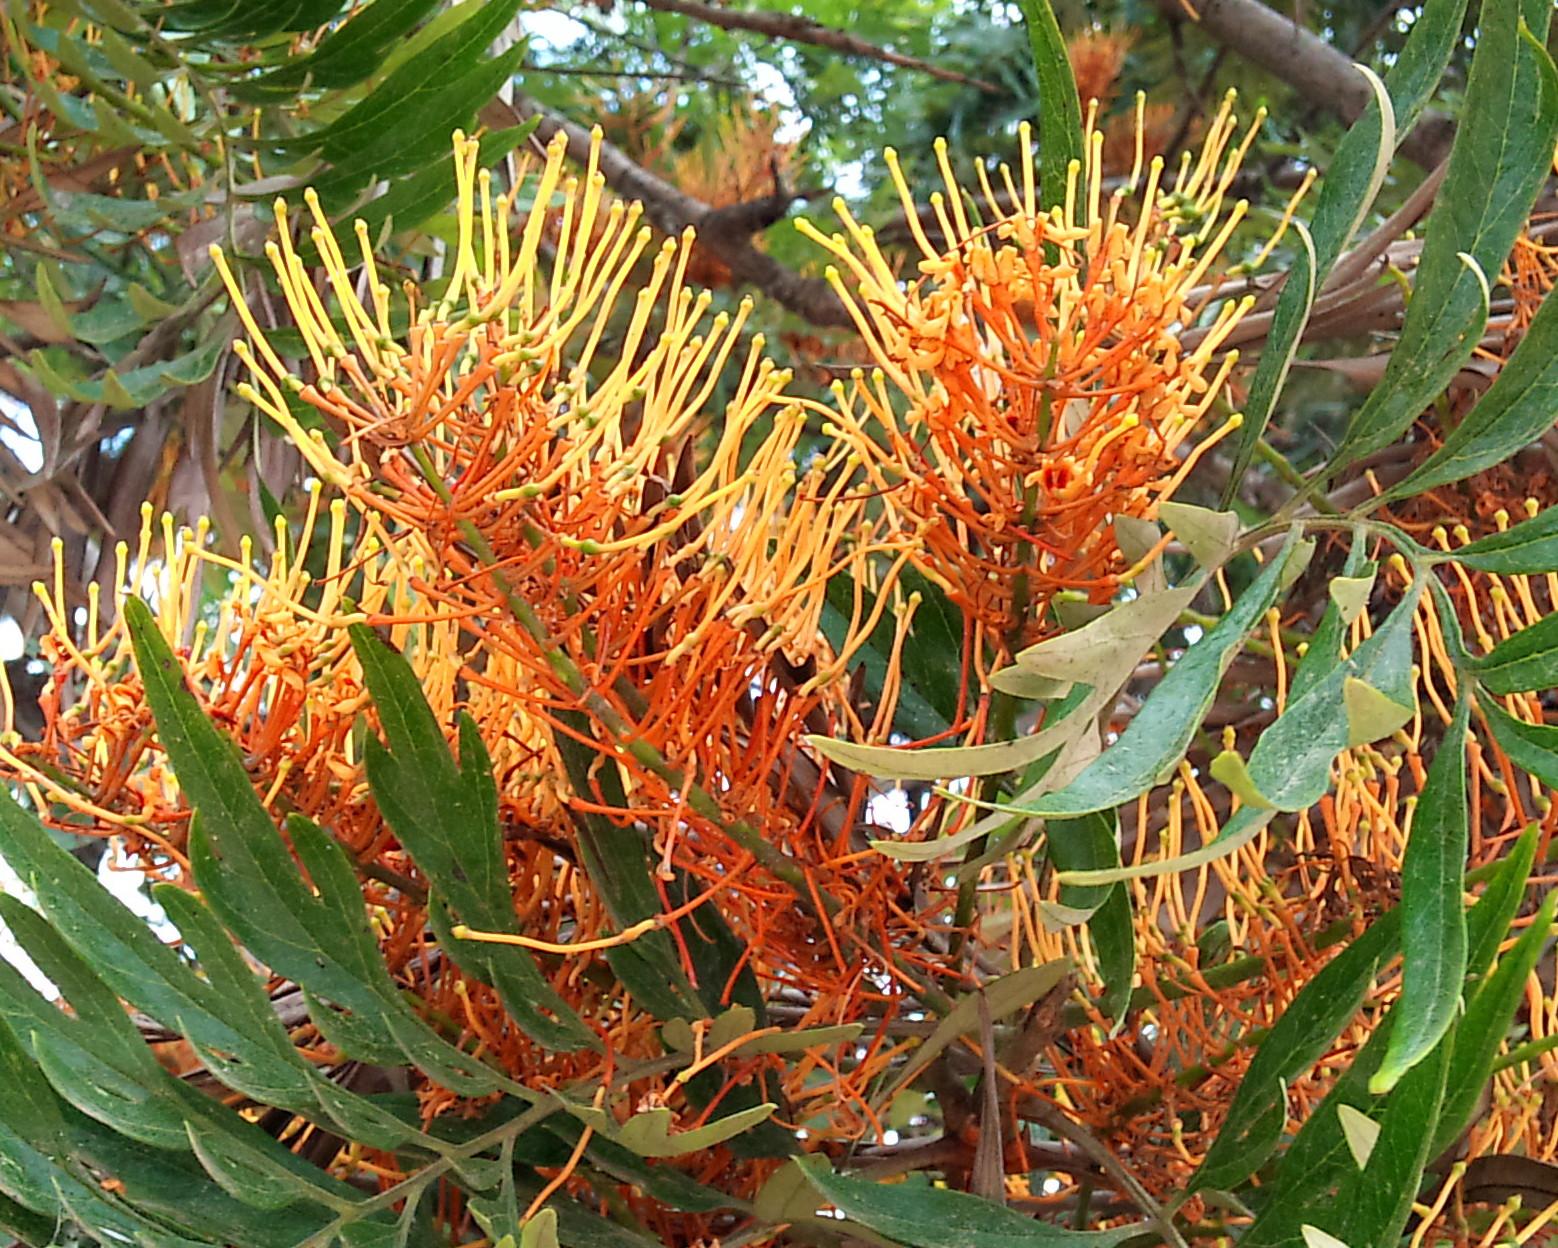 Rboles con alma roble australiano grevillea robusta for Arboles crecimiento rapido hoja perenne